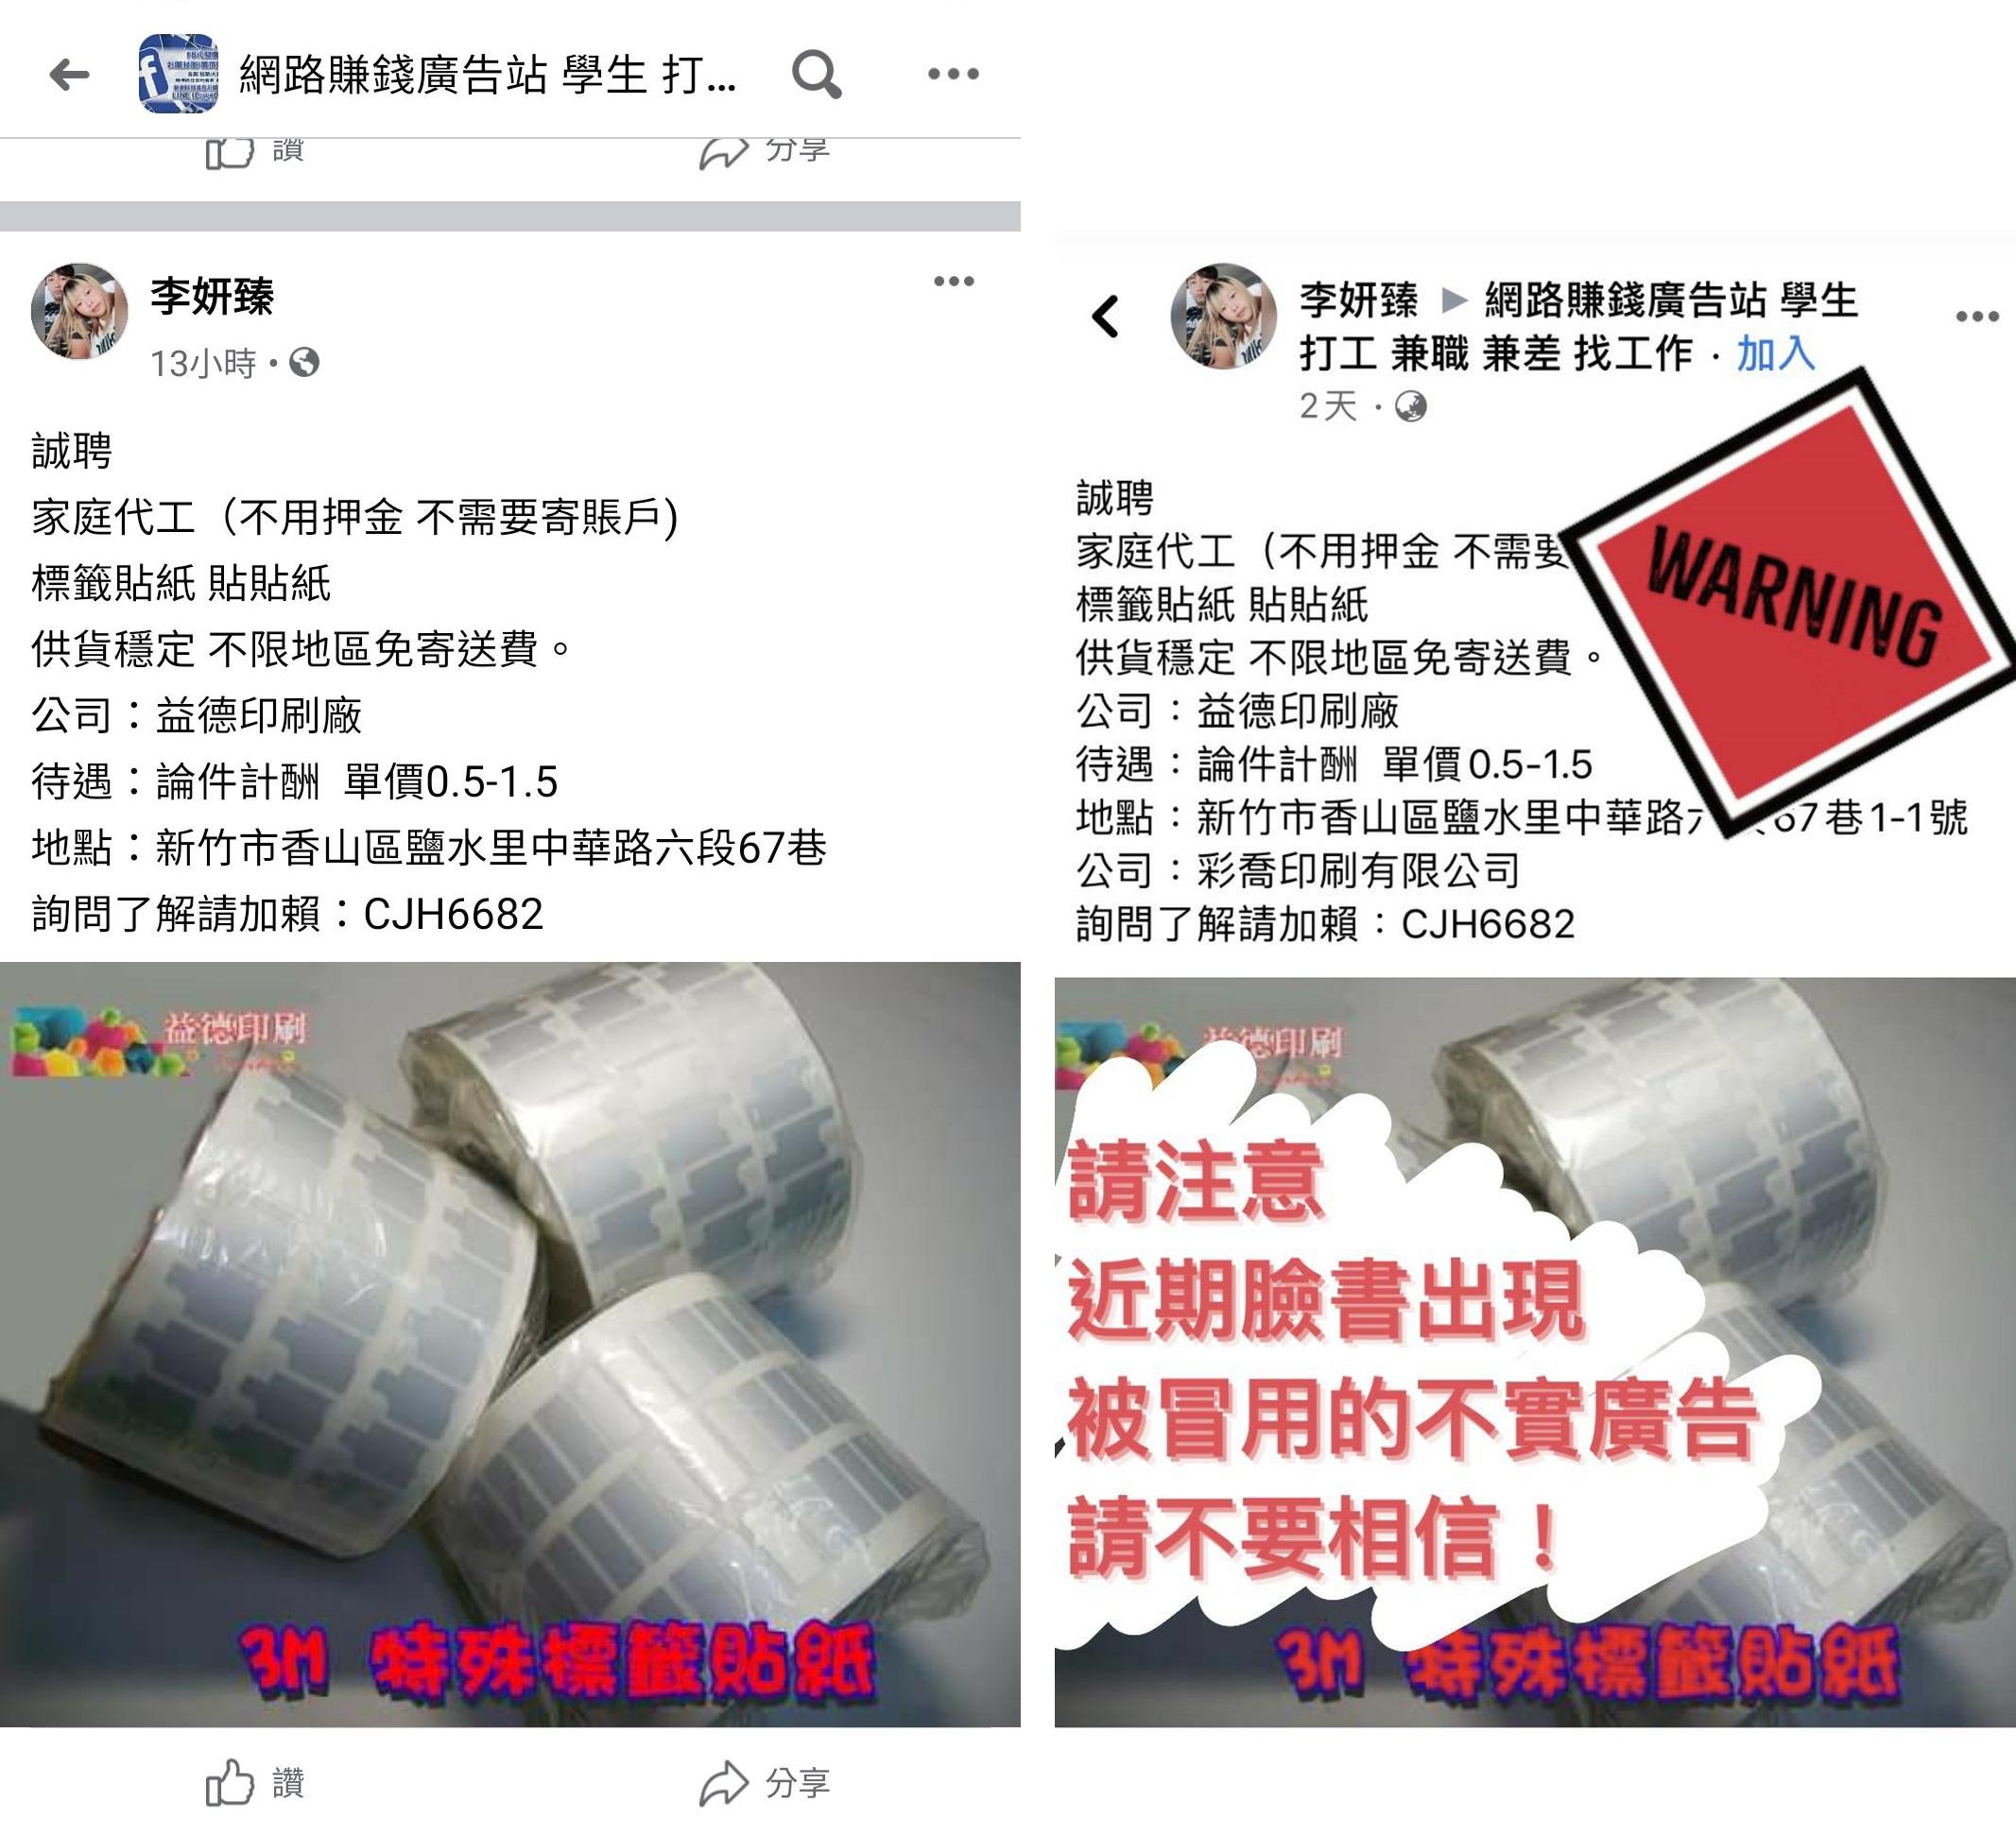 FB疑似詐騙騙取個資之不實廣告